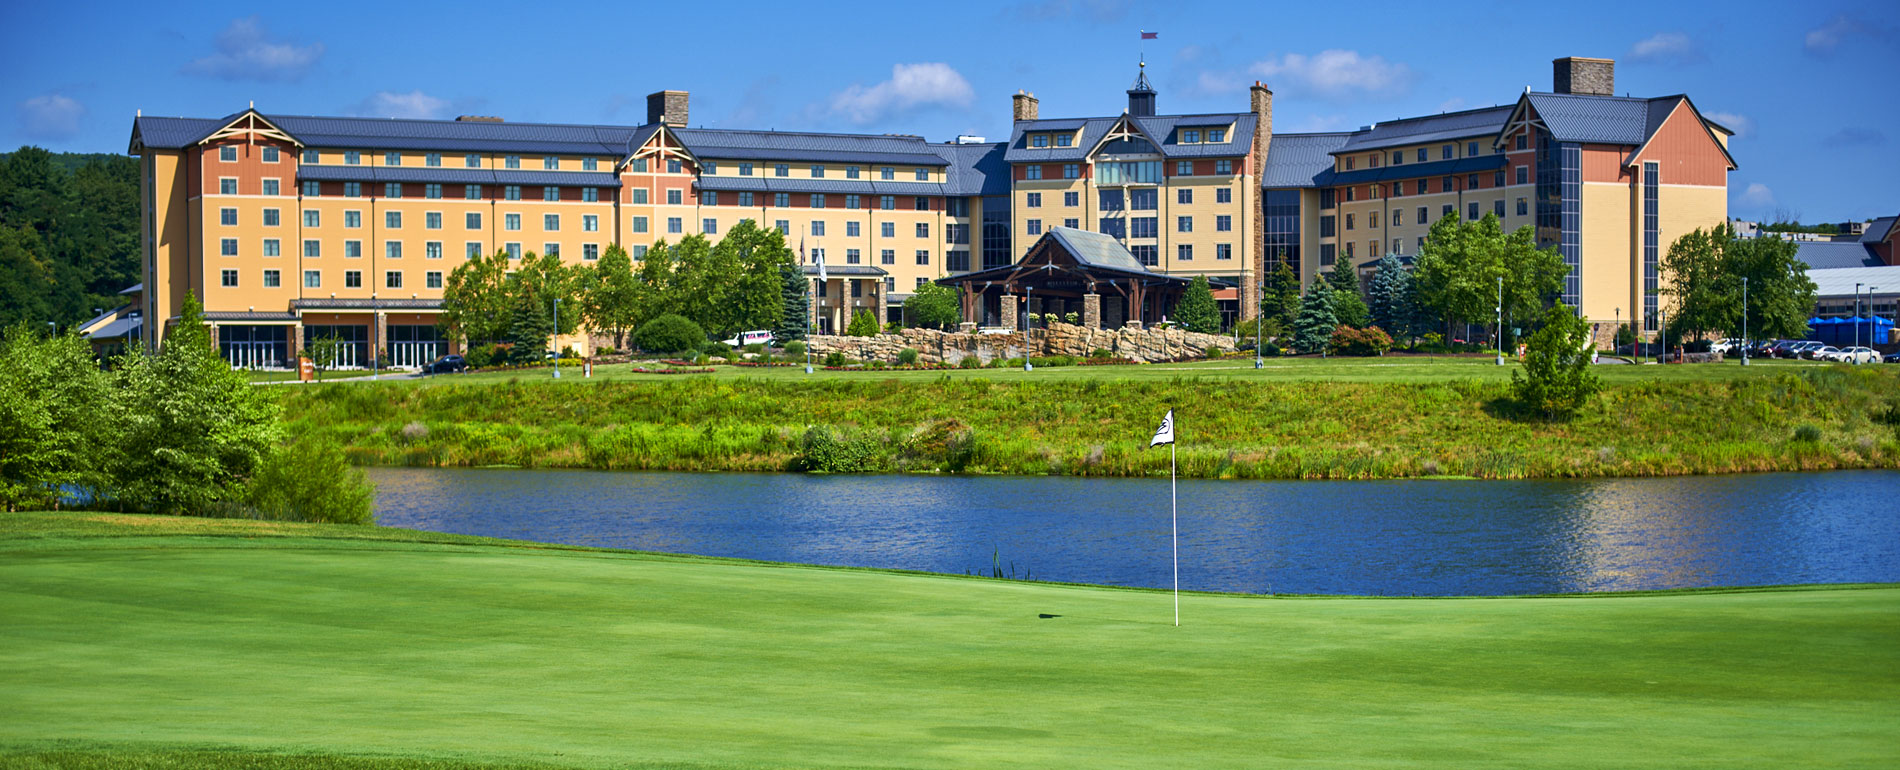 mt pocono casino hotel spa resort - golf course with pond view